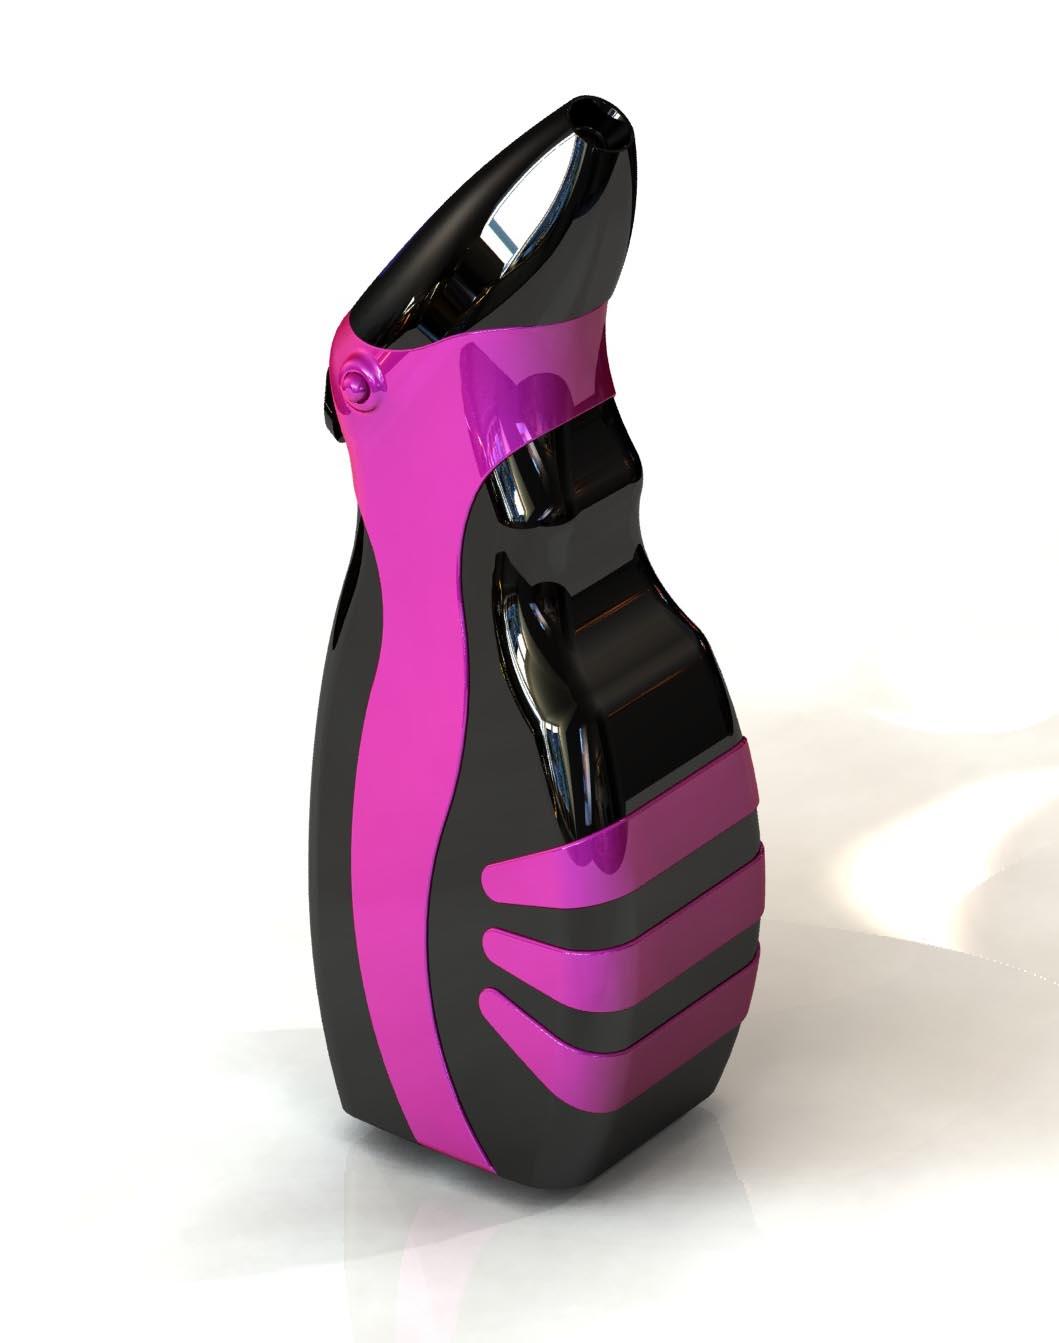 Design concept of Temptu handheld cosmetic airbrush.